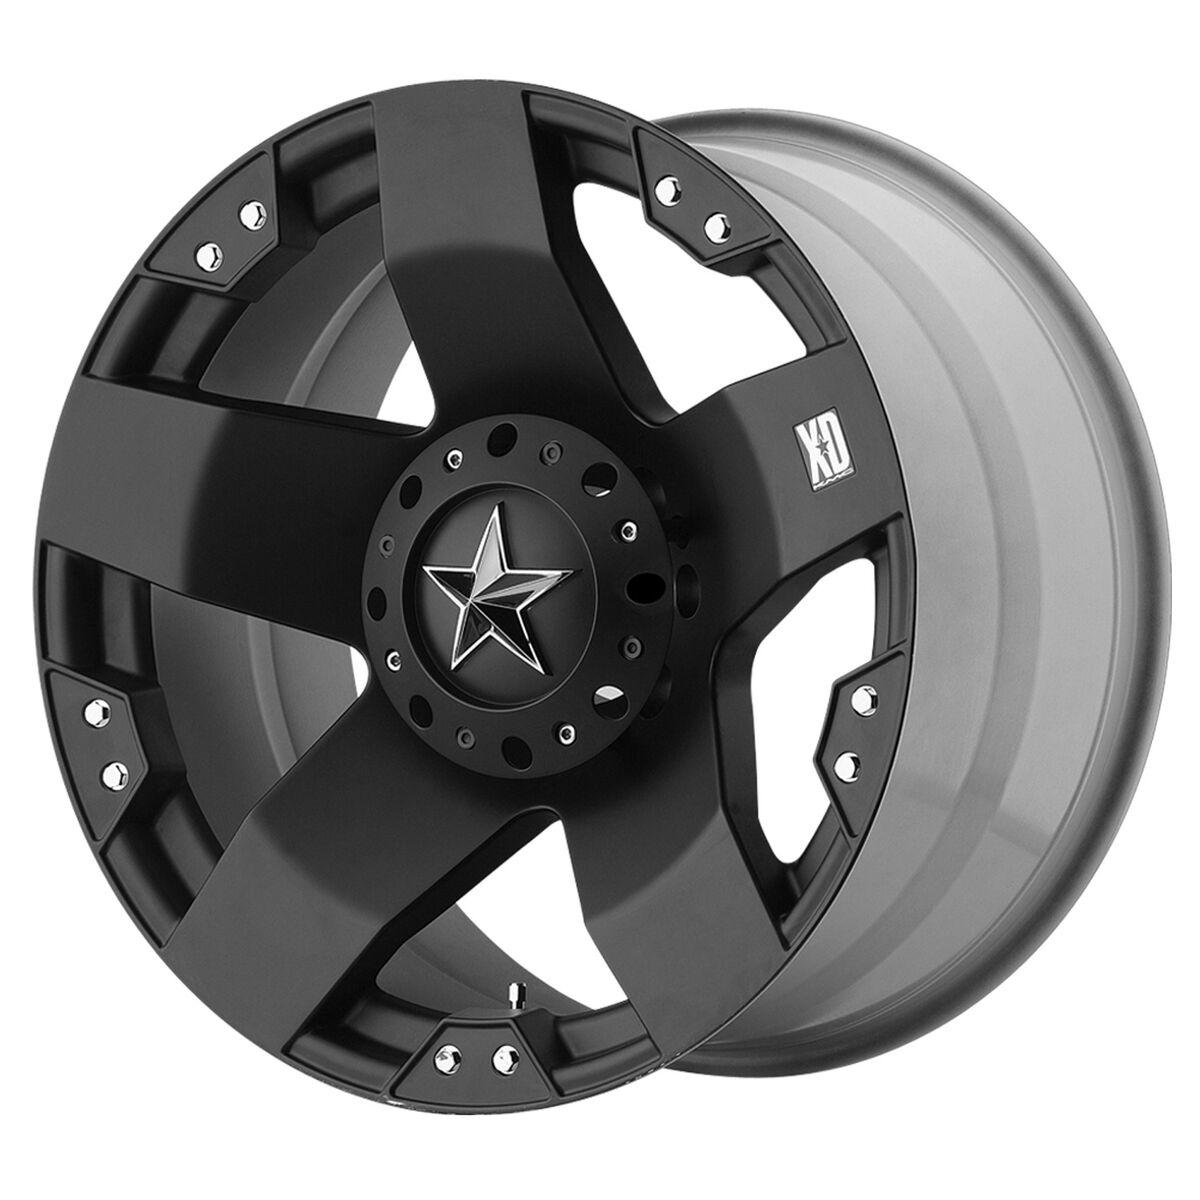 Black wheels rims KMC XD 775 Rockstar Jeep Wrangler 2007 2013 only 5x5